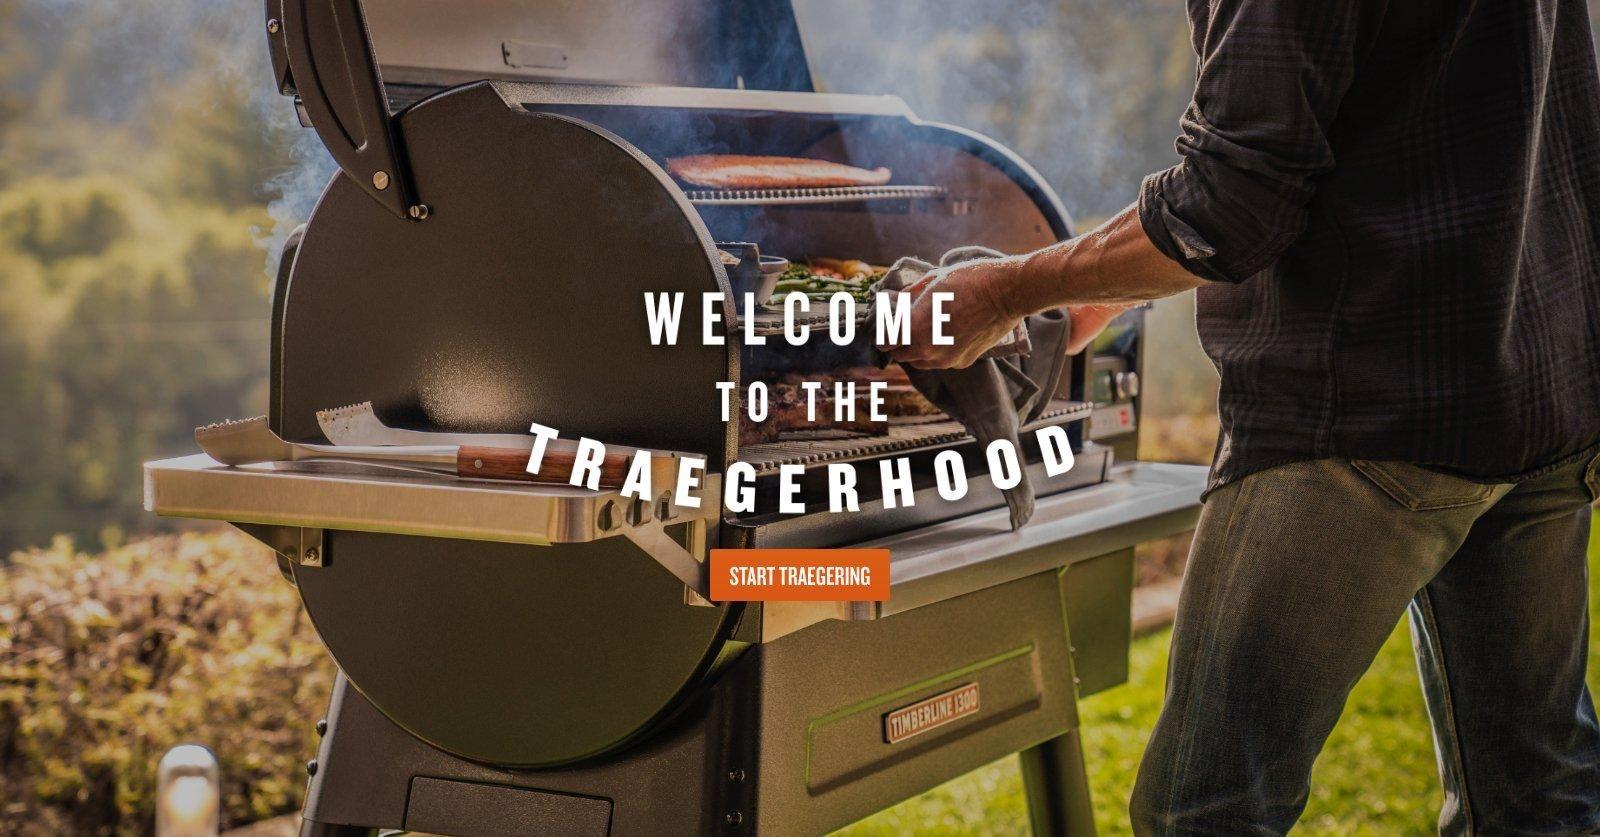 Welcome to the Traegerhood